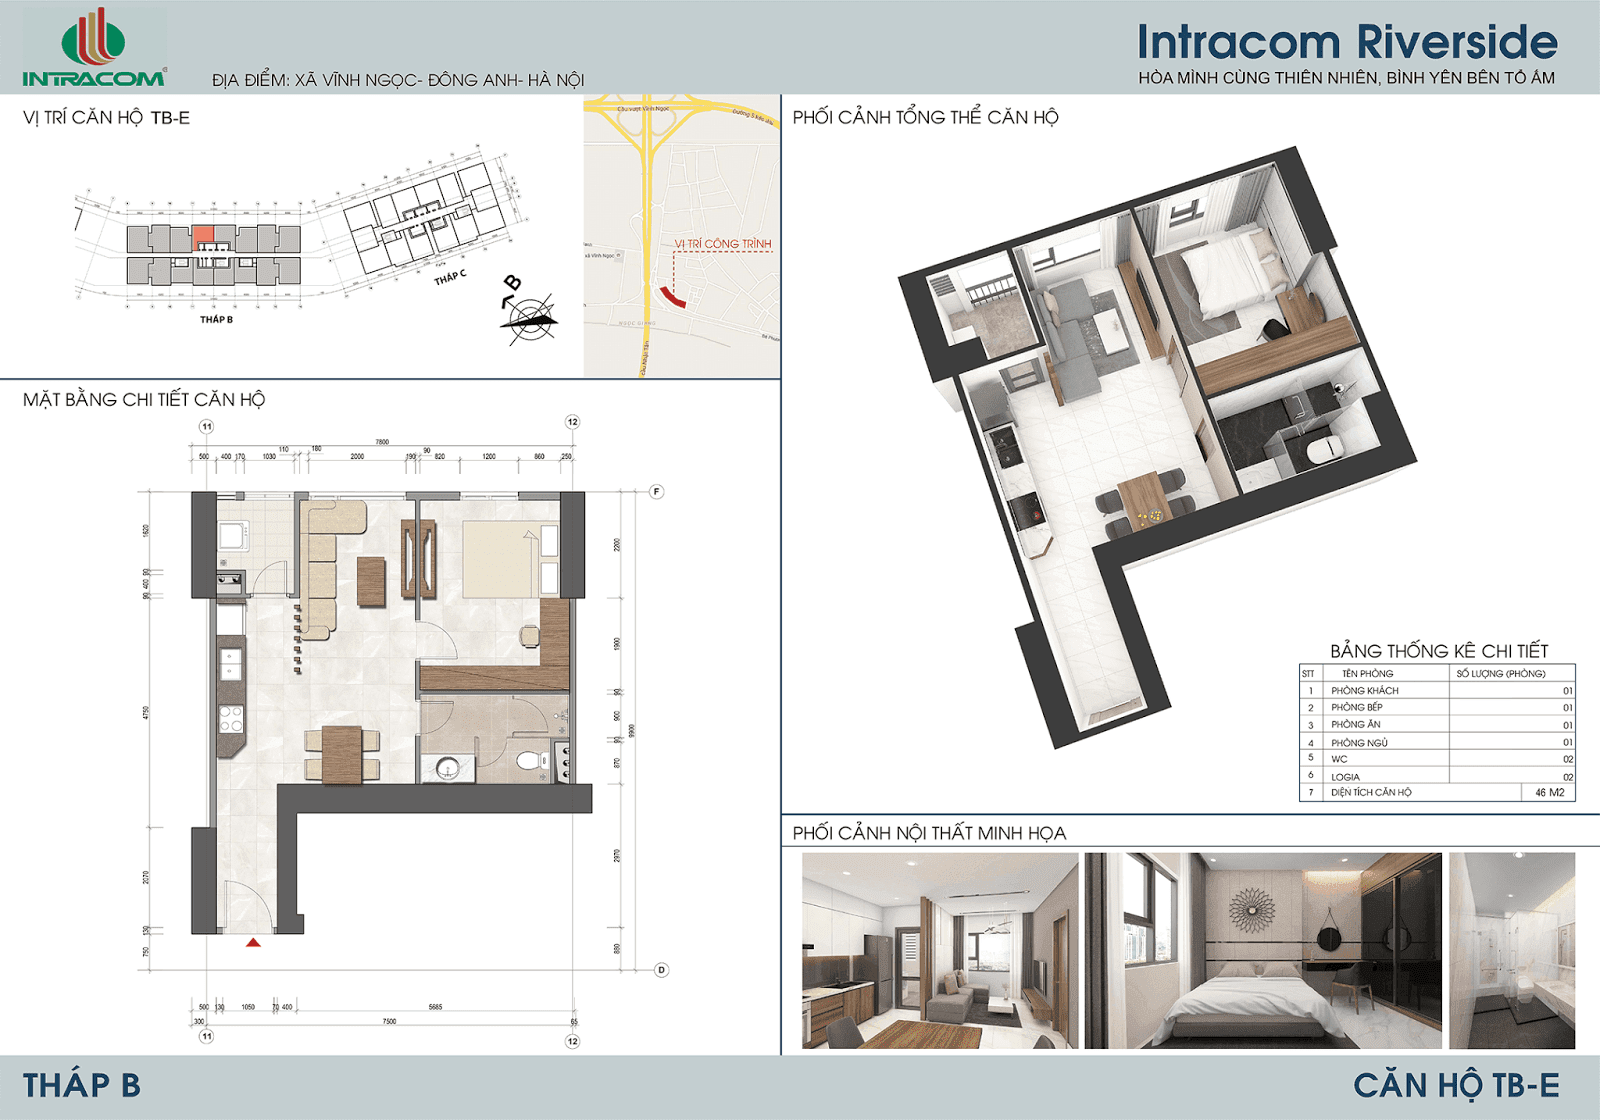 Thiết kế căn 12 - 12A - 64m2